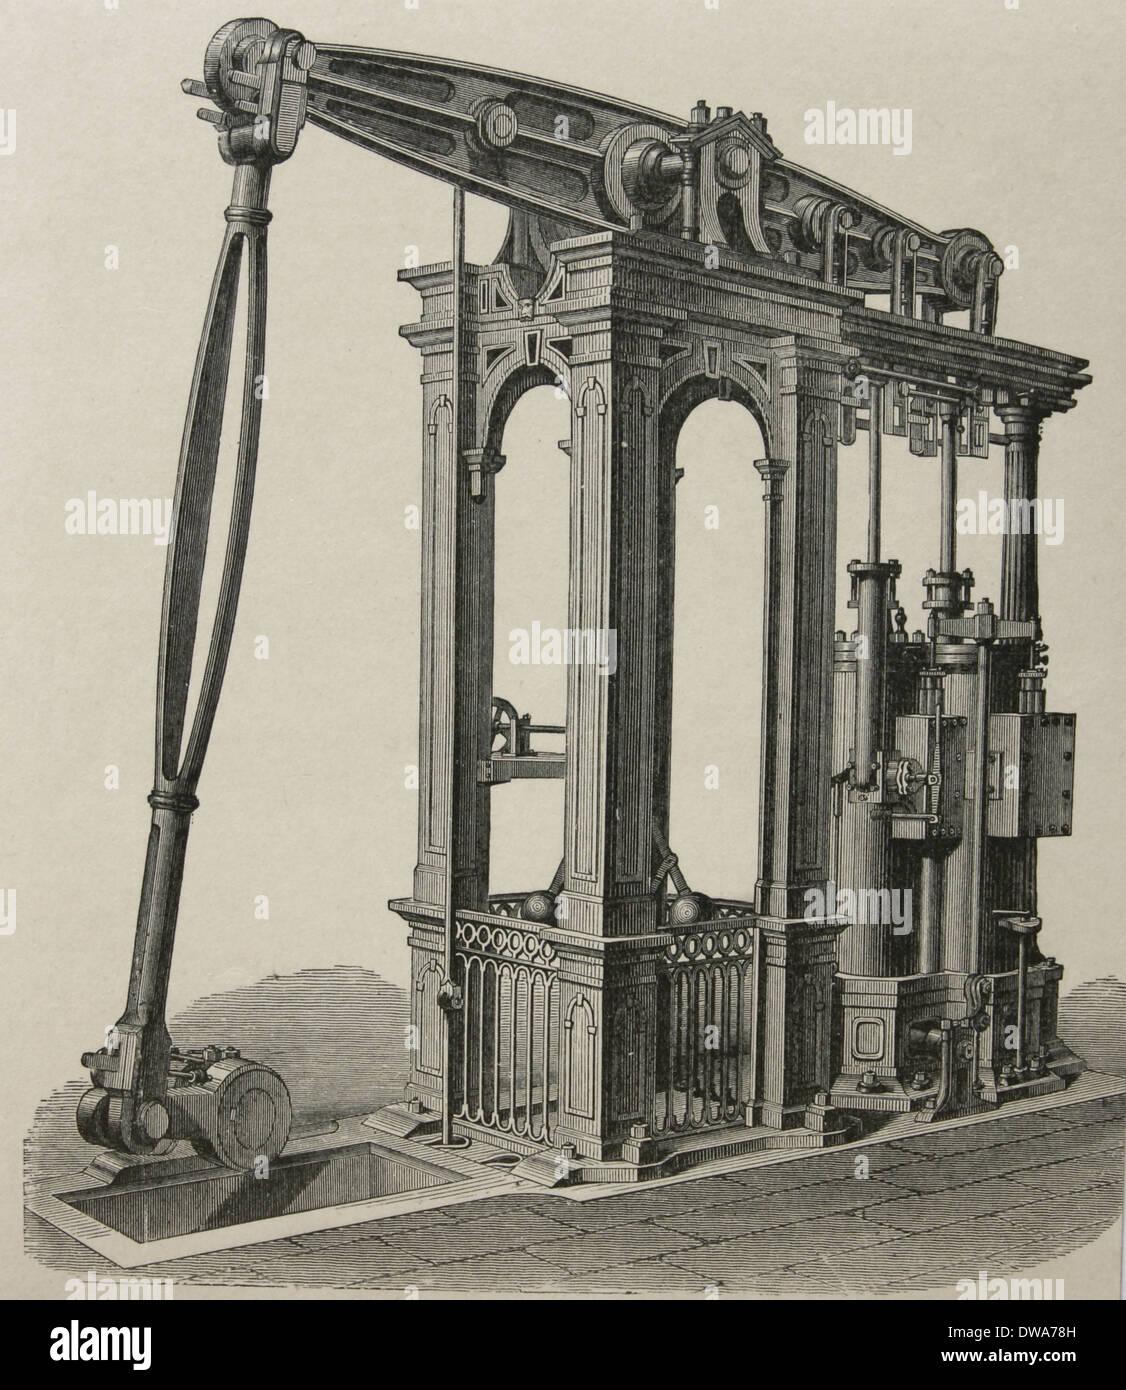 Steam engine by Cornish engineer Arthur Woolf (1766-1837). Engraving, 19th century. - Stock Image